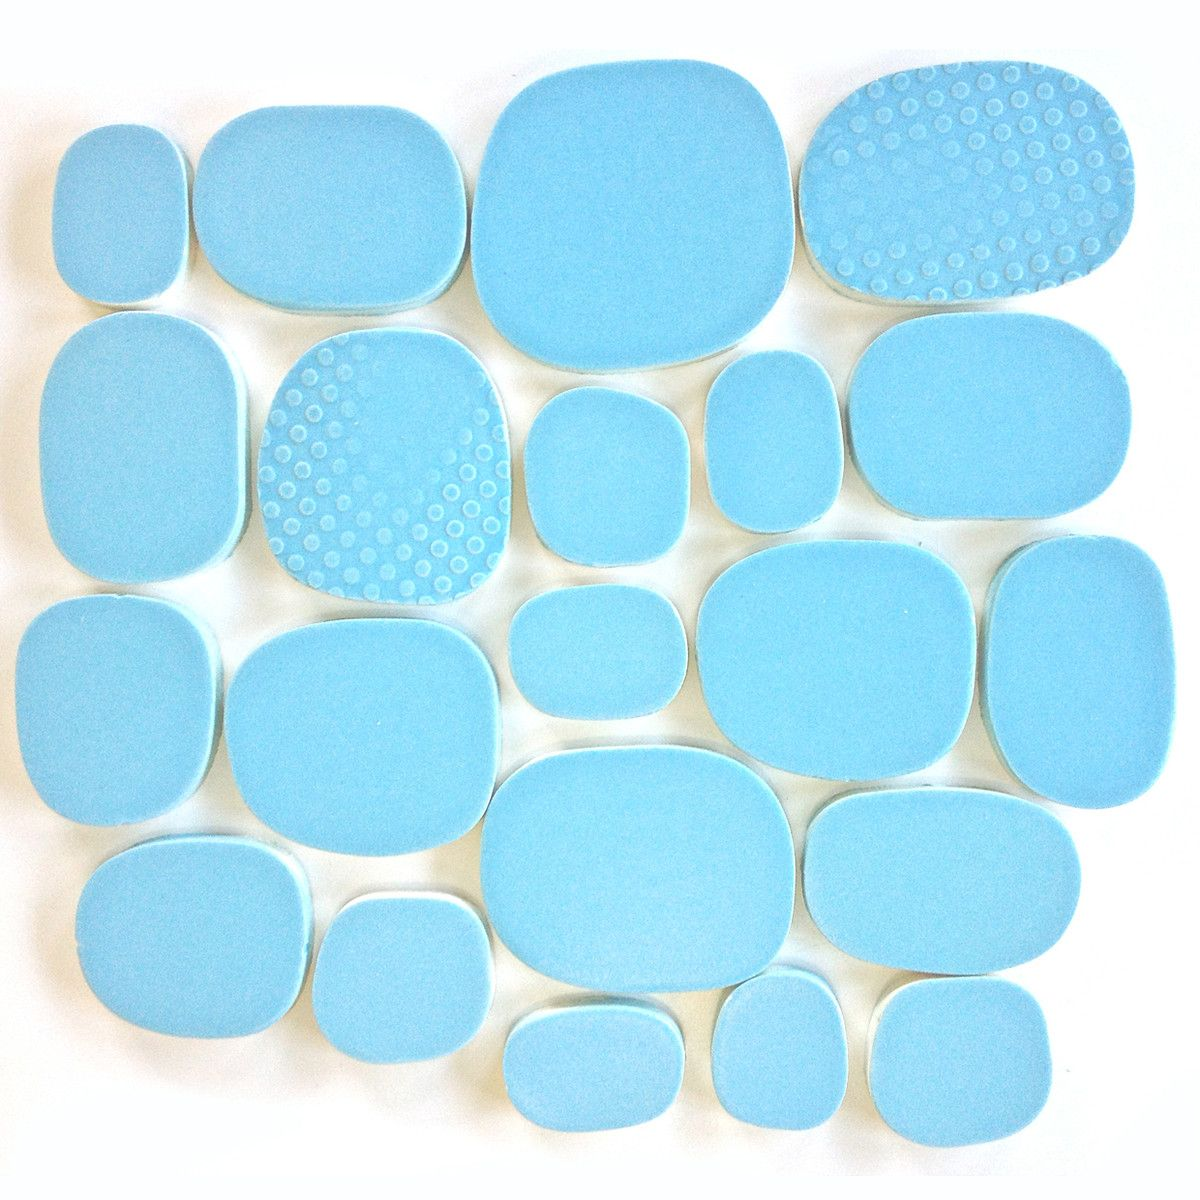 Rex Ray Comet Ceramic Tiles By Modwall 12 5 X12 5 Ceramic Tiles